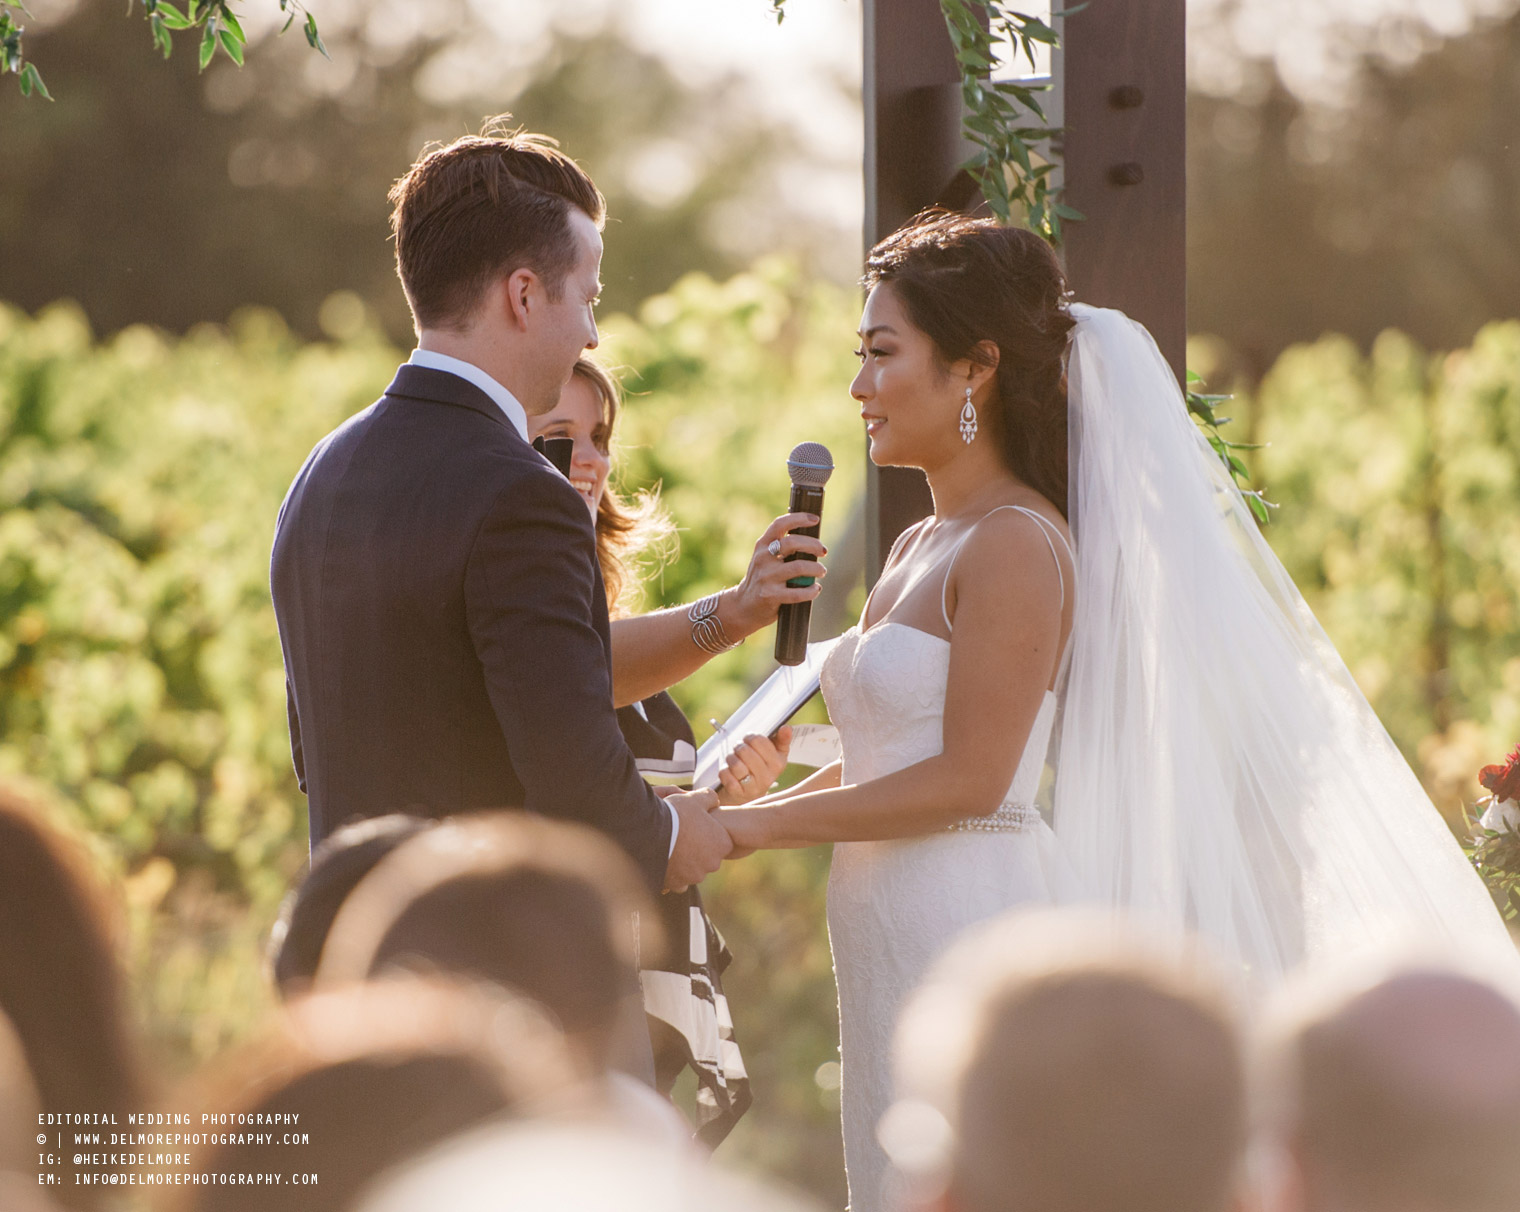 top-windsor-winery-wedding-photographer-040.jpg